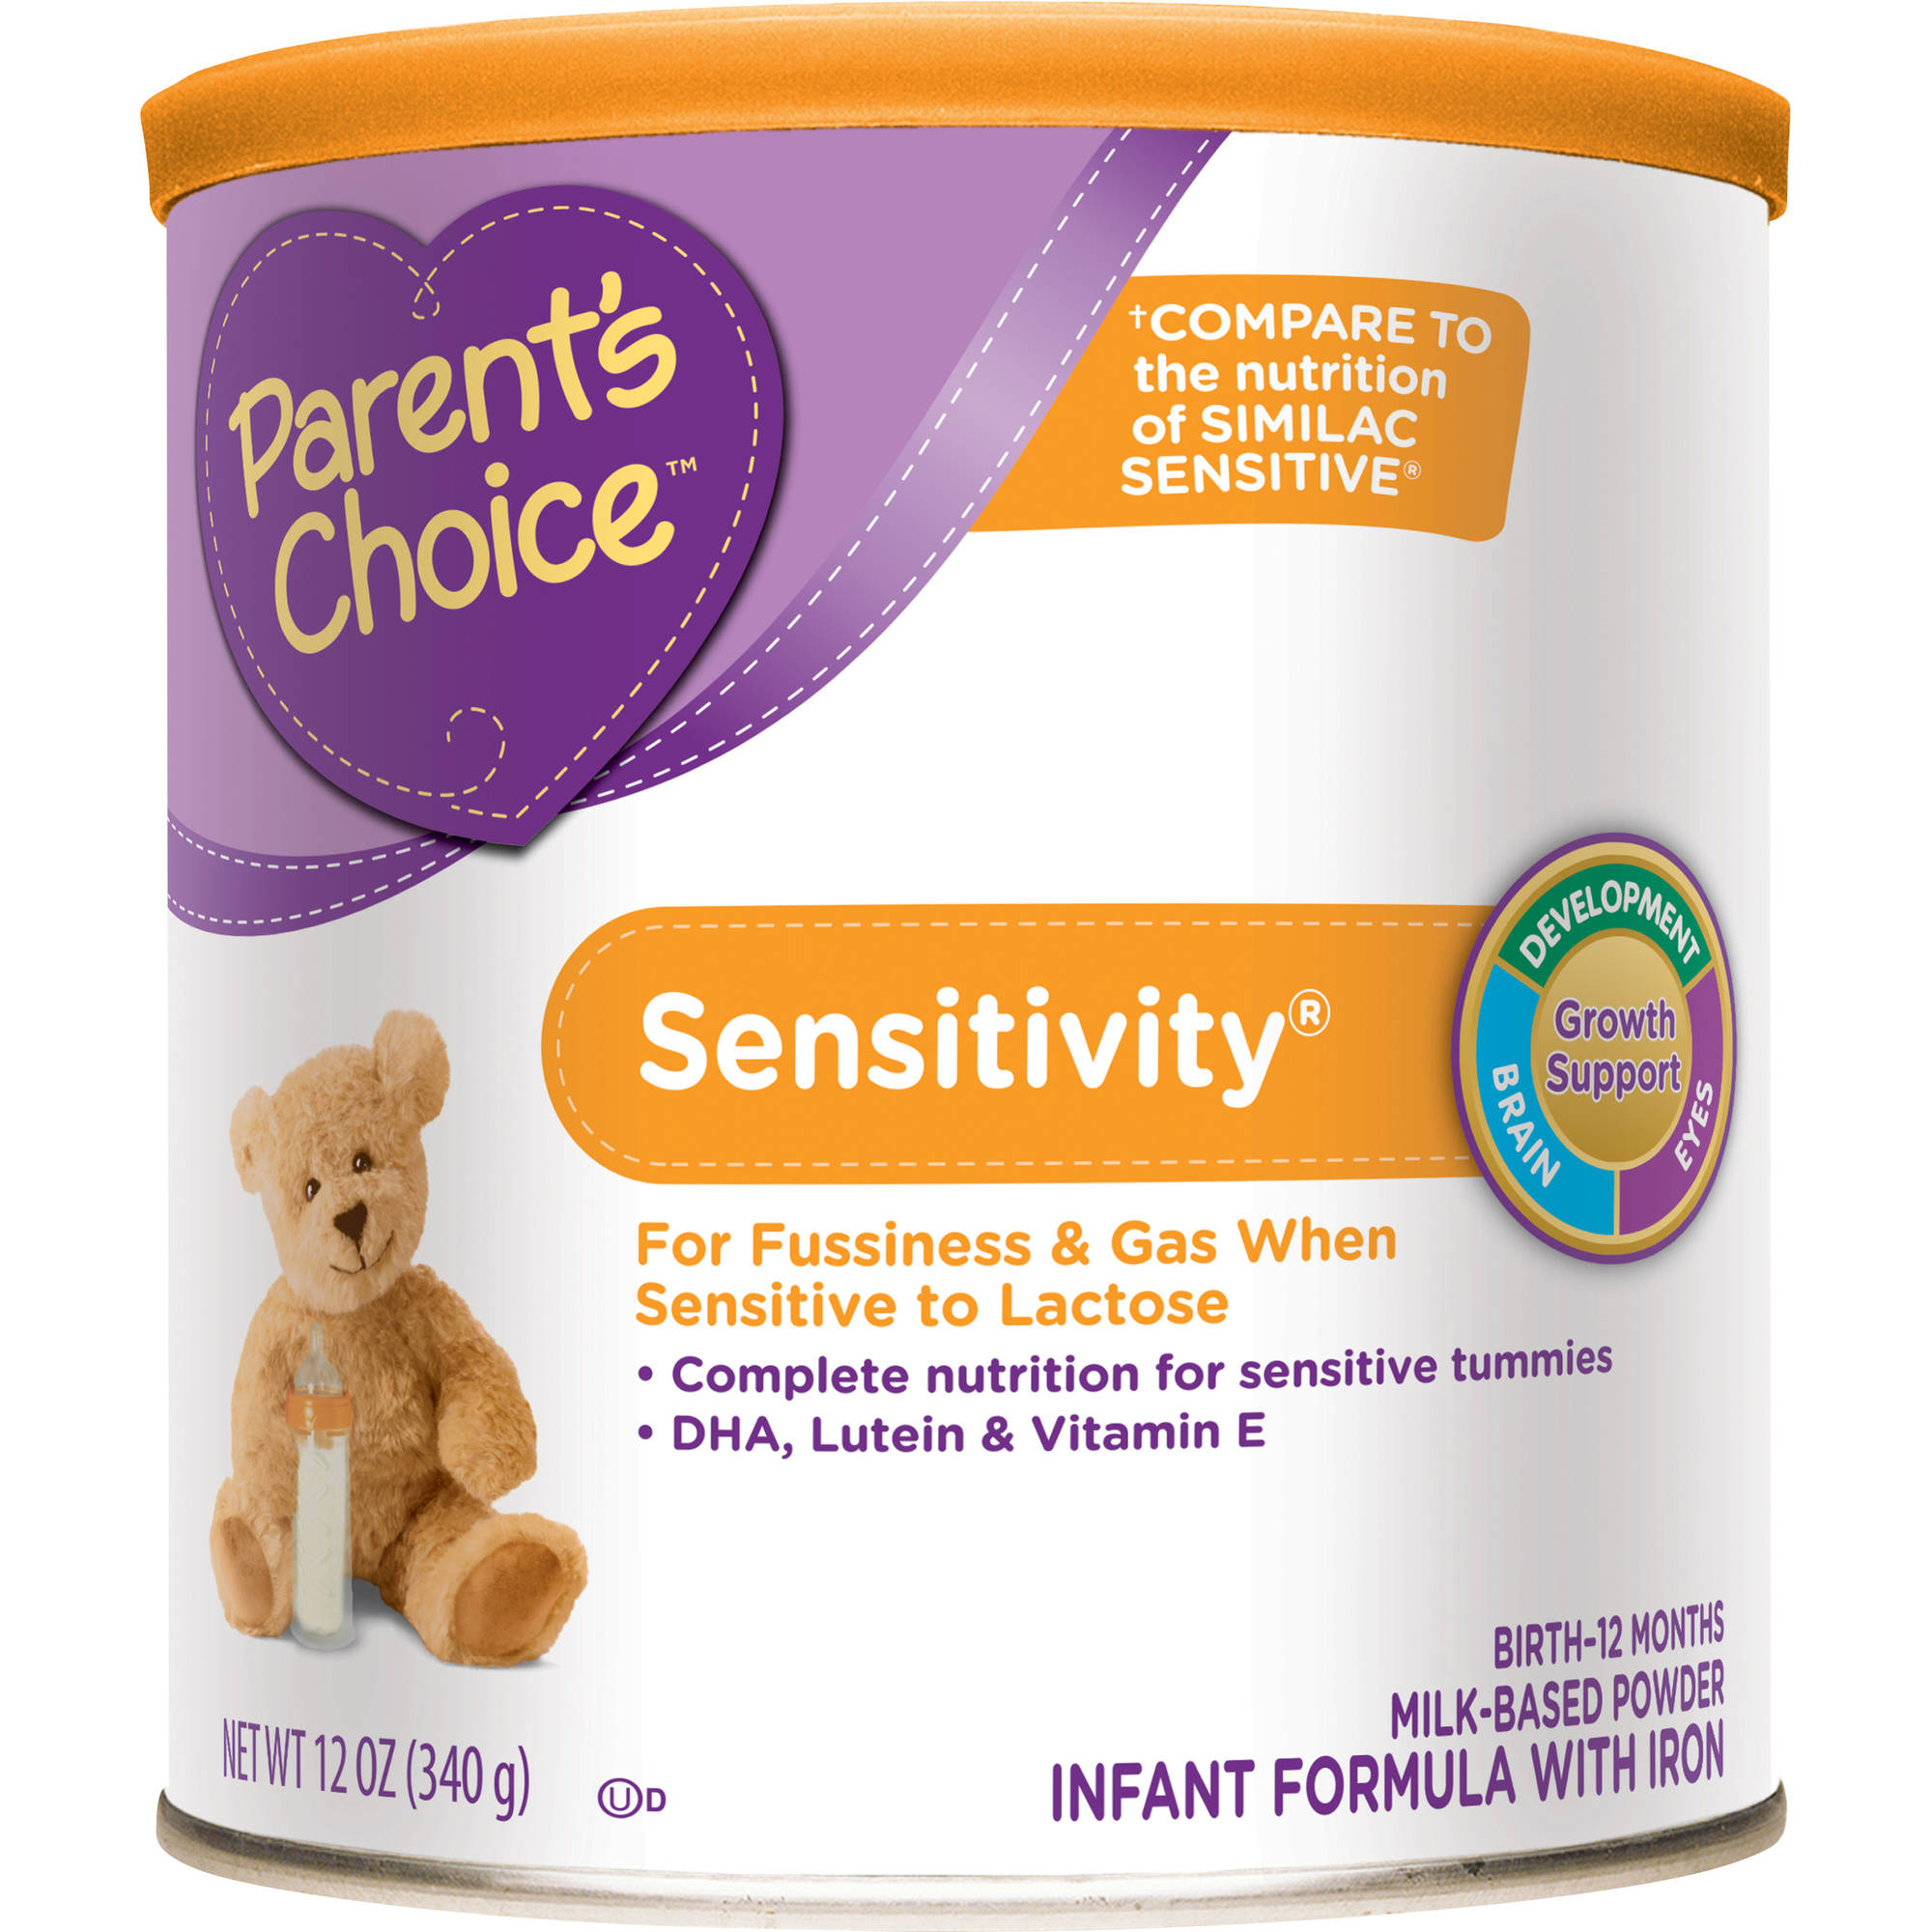 Parent's Choice Sensitivity Powder Infant Formula with Iron, 12oz